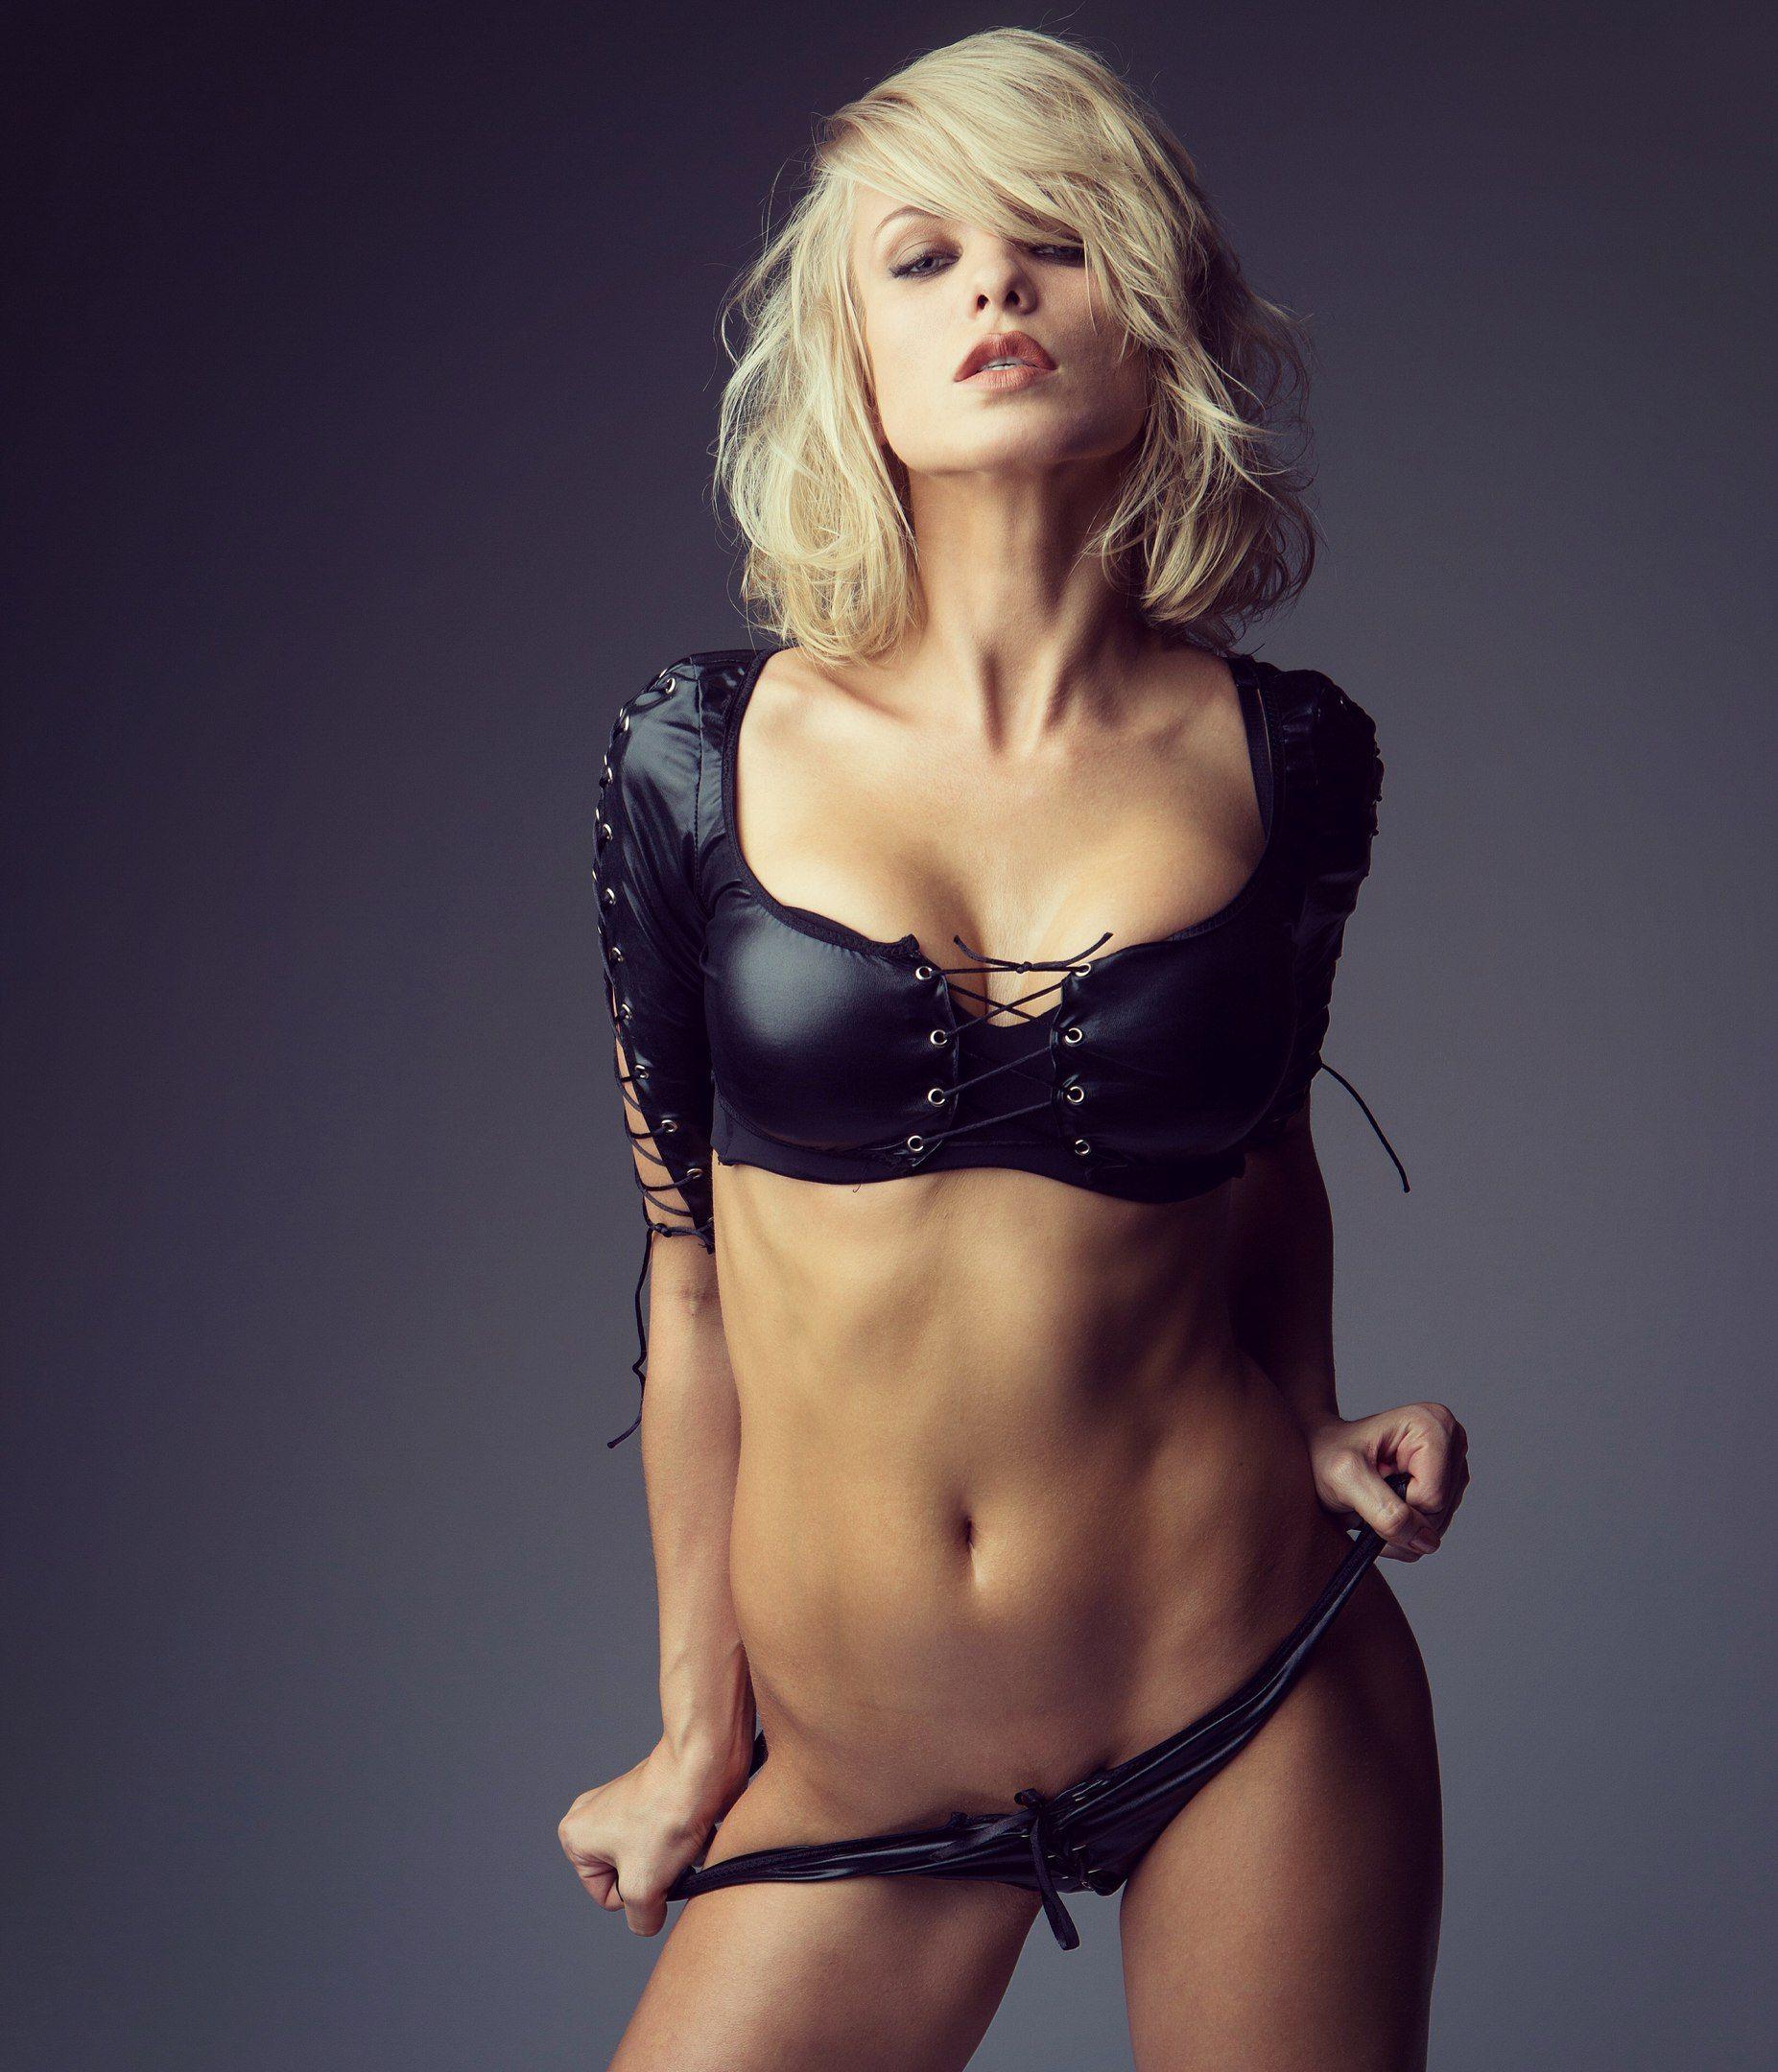 Ekaterina Enokaeva | Ekaterina Enokaeva | Pinterest | Nice, Models and Black